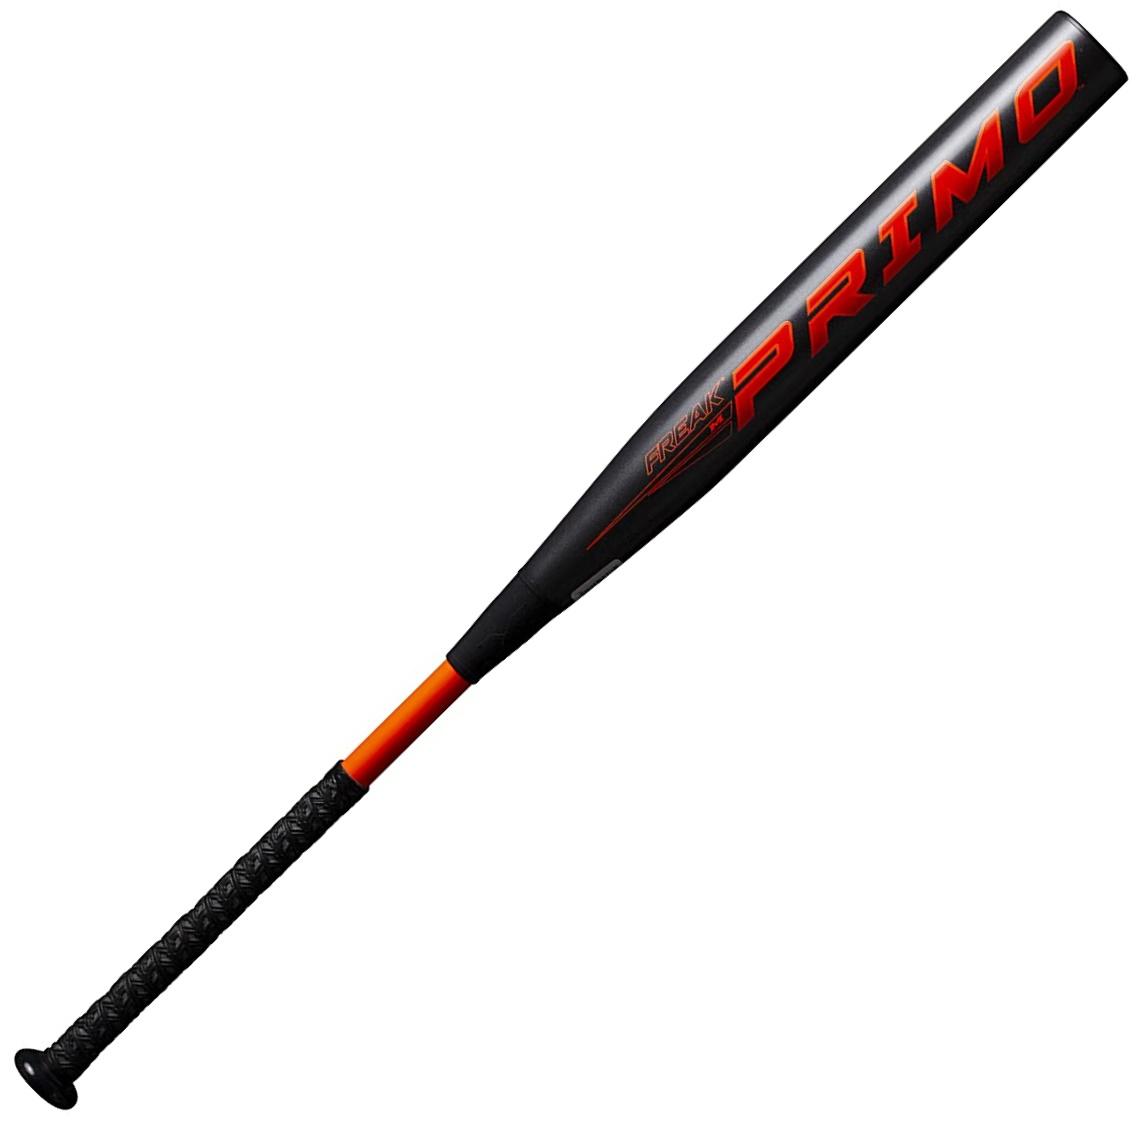 miken-freak-primo-14-usa-asa-maxload-slowpitch-softball-bat-34-inch-30-oz MP21MA-3-30